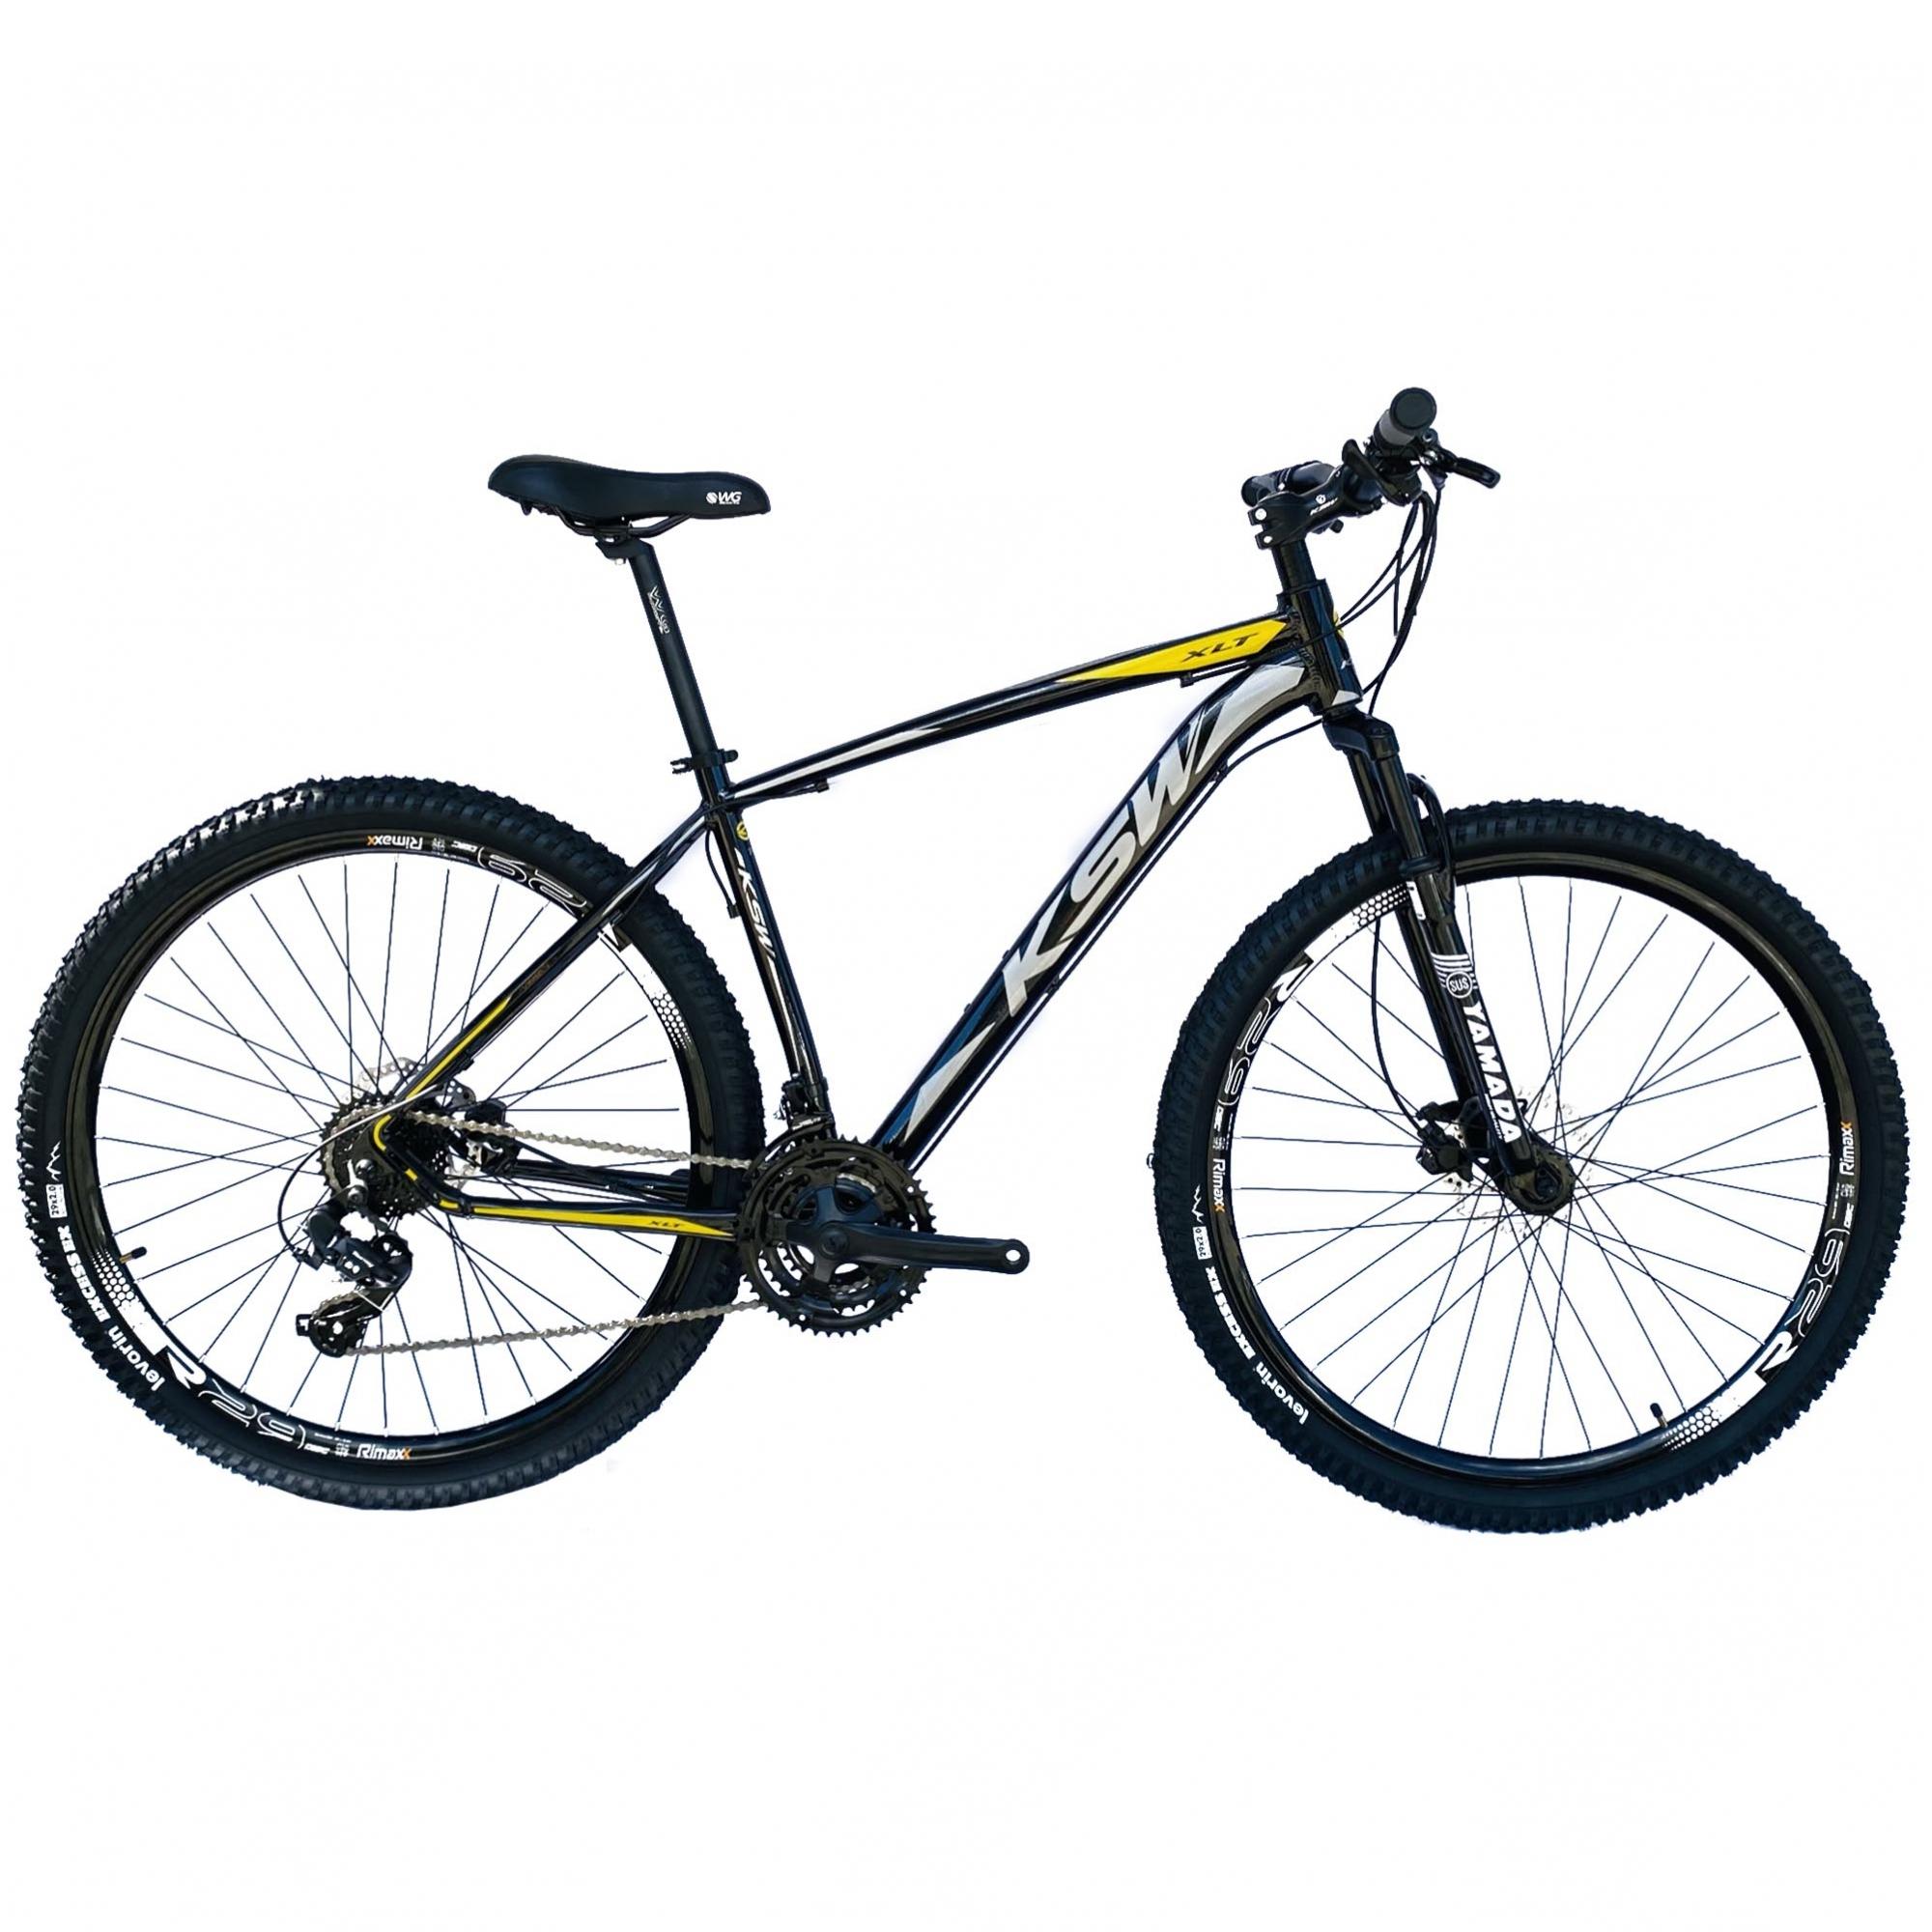 Bicicleta Aro 29 XLT 24v Cambios  Shimano Freio Hidraulico  - KSW